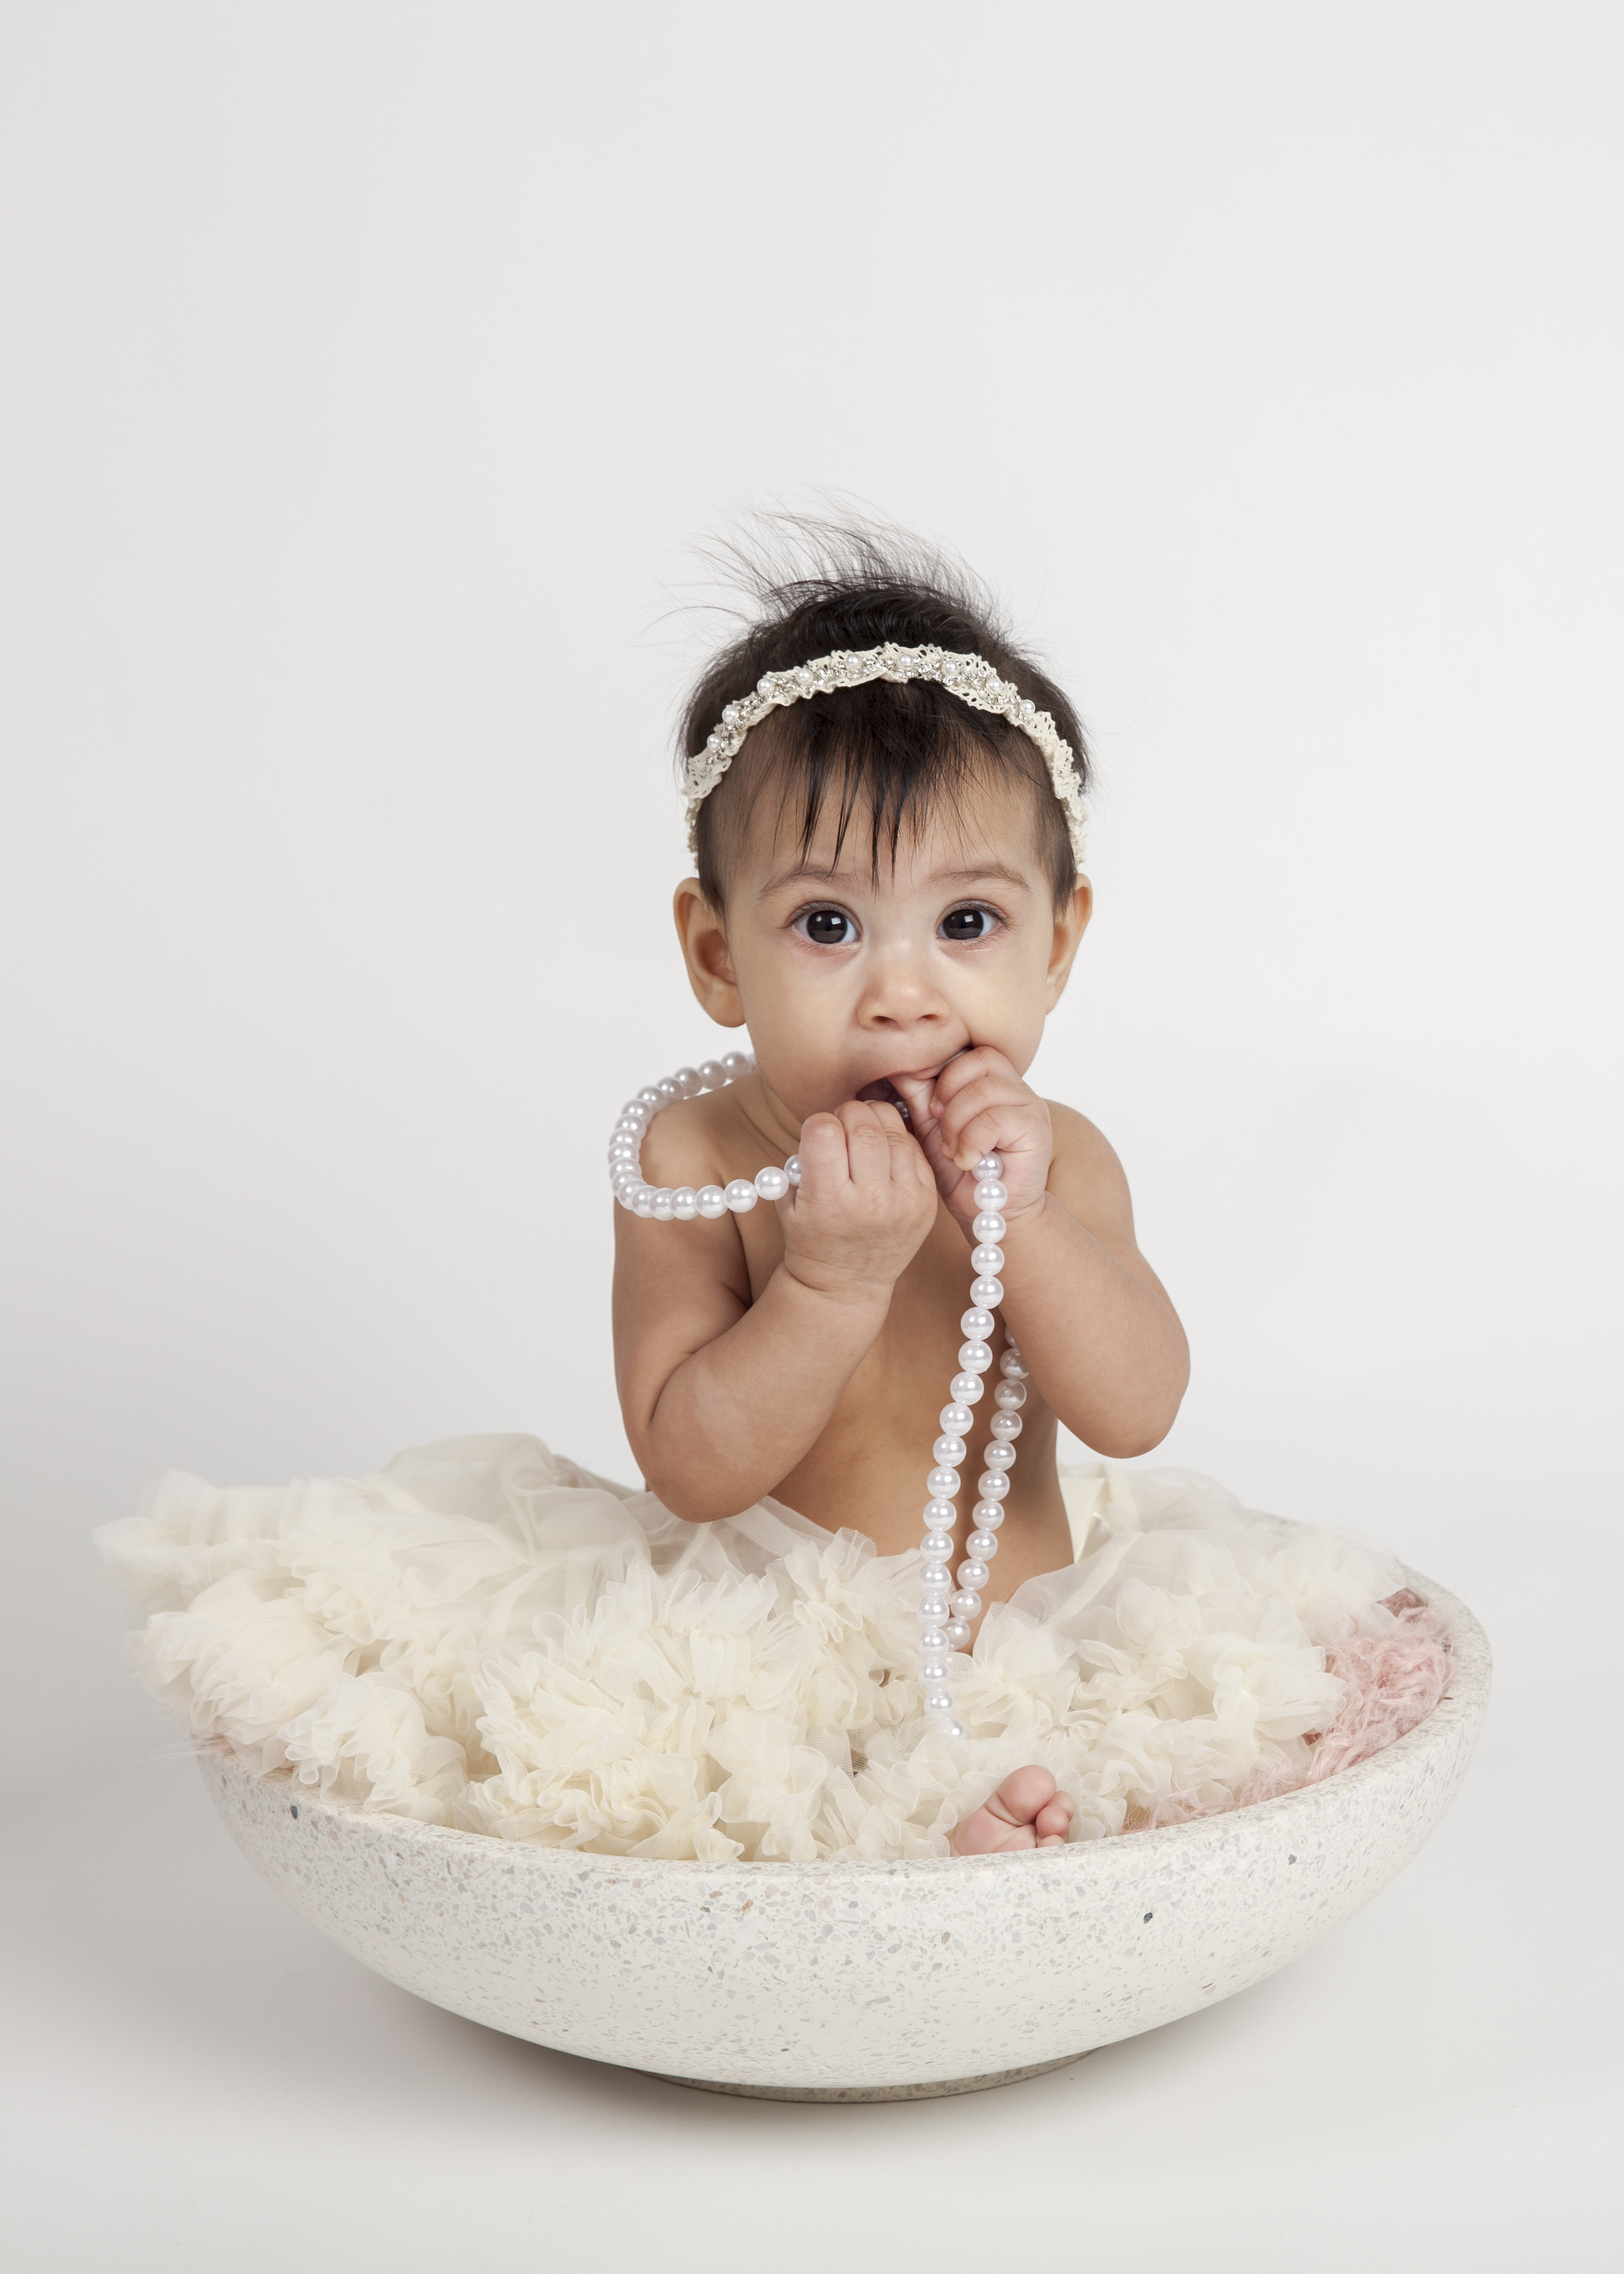 Kingwood baby photographer